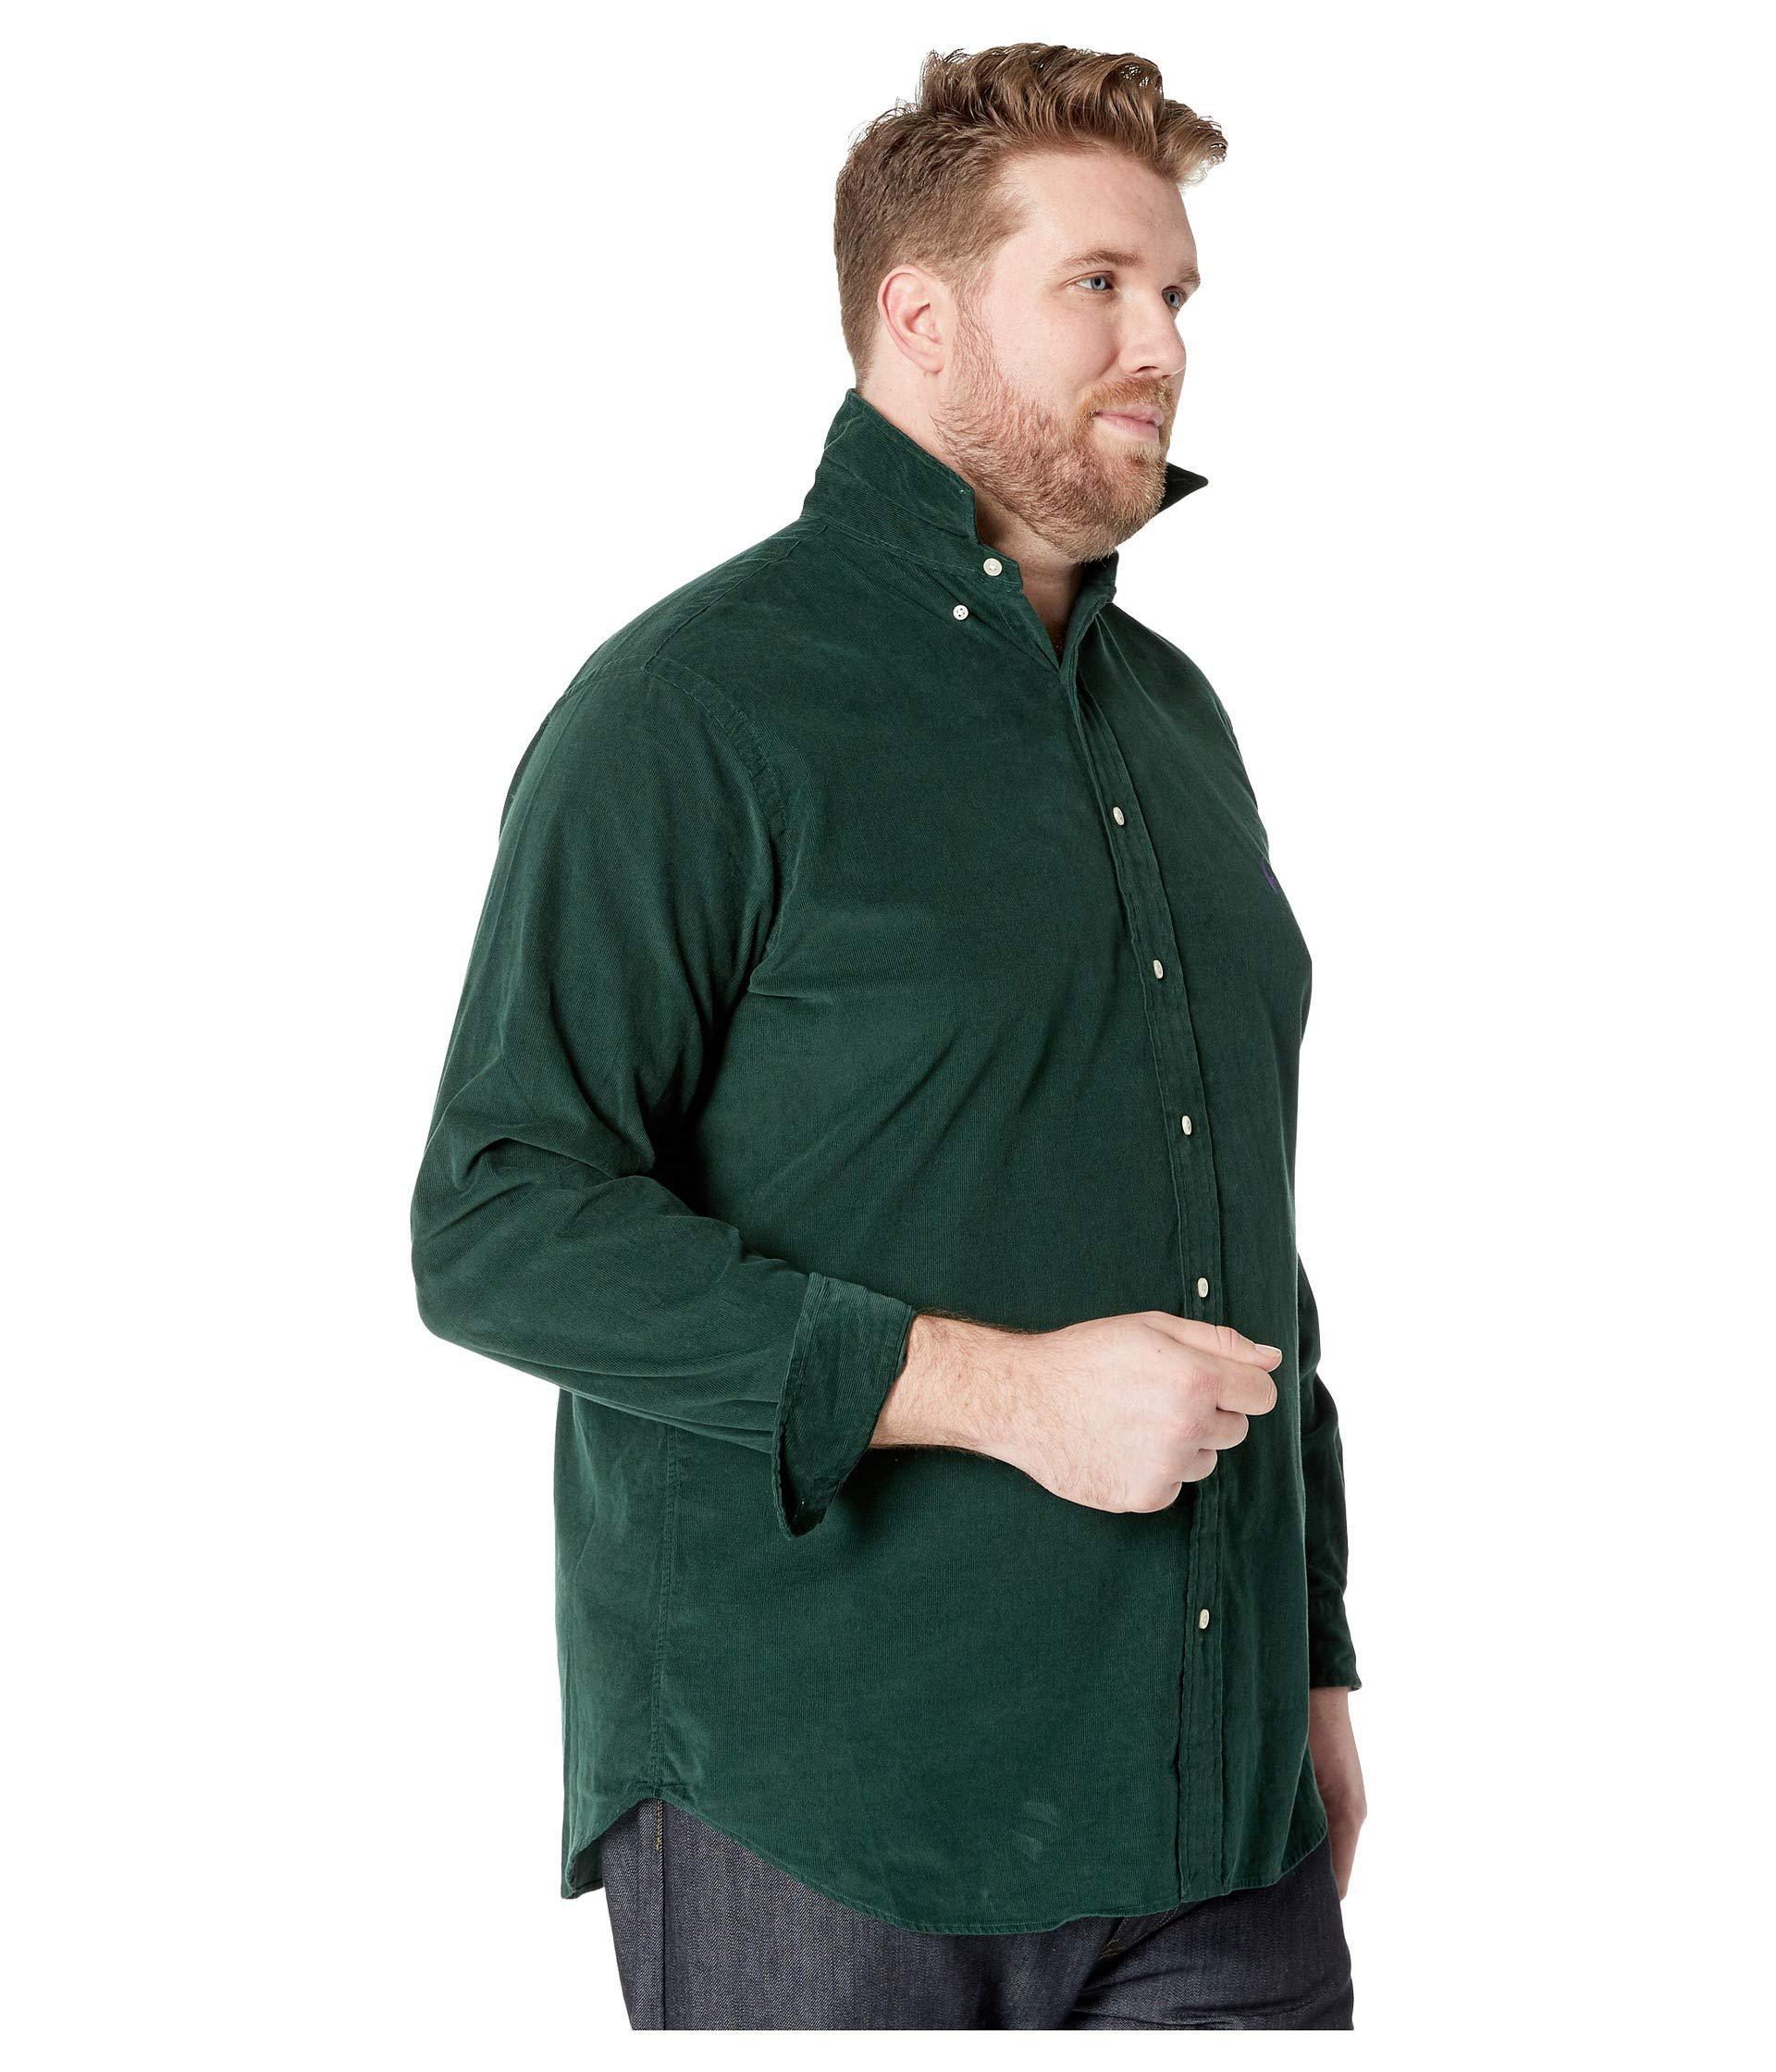 BlackMen's Ralph Men Green Polo Tall Sportshirtpolo For Clothing Lauren Big Corduroy Jlc3TFK1